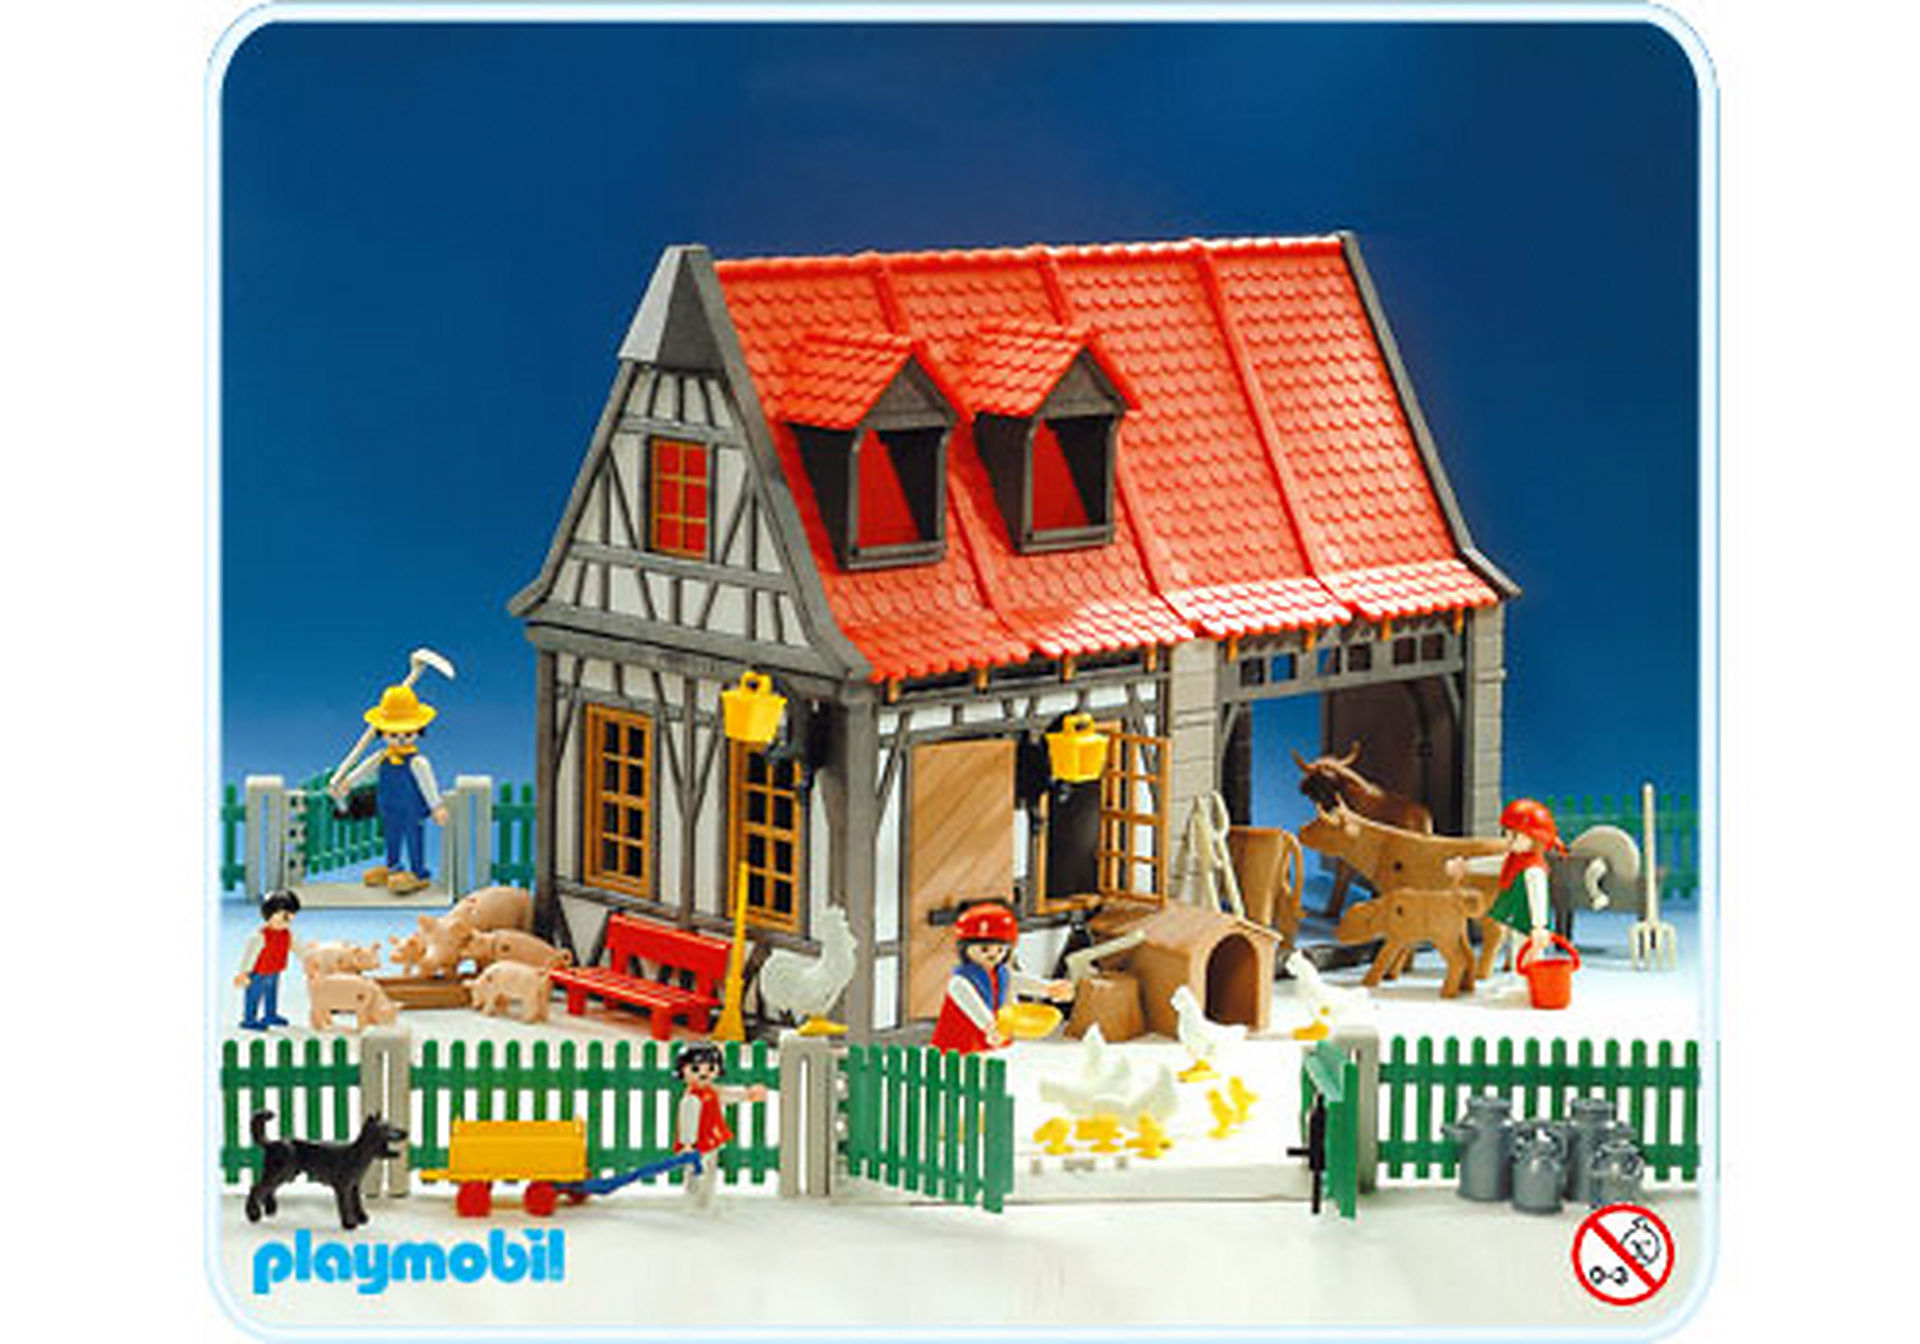 http://media.playmobil.com/i/playmobil/3556-A_product_detail/Bauernhaus